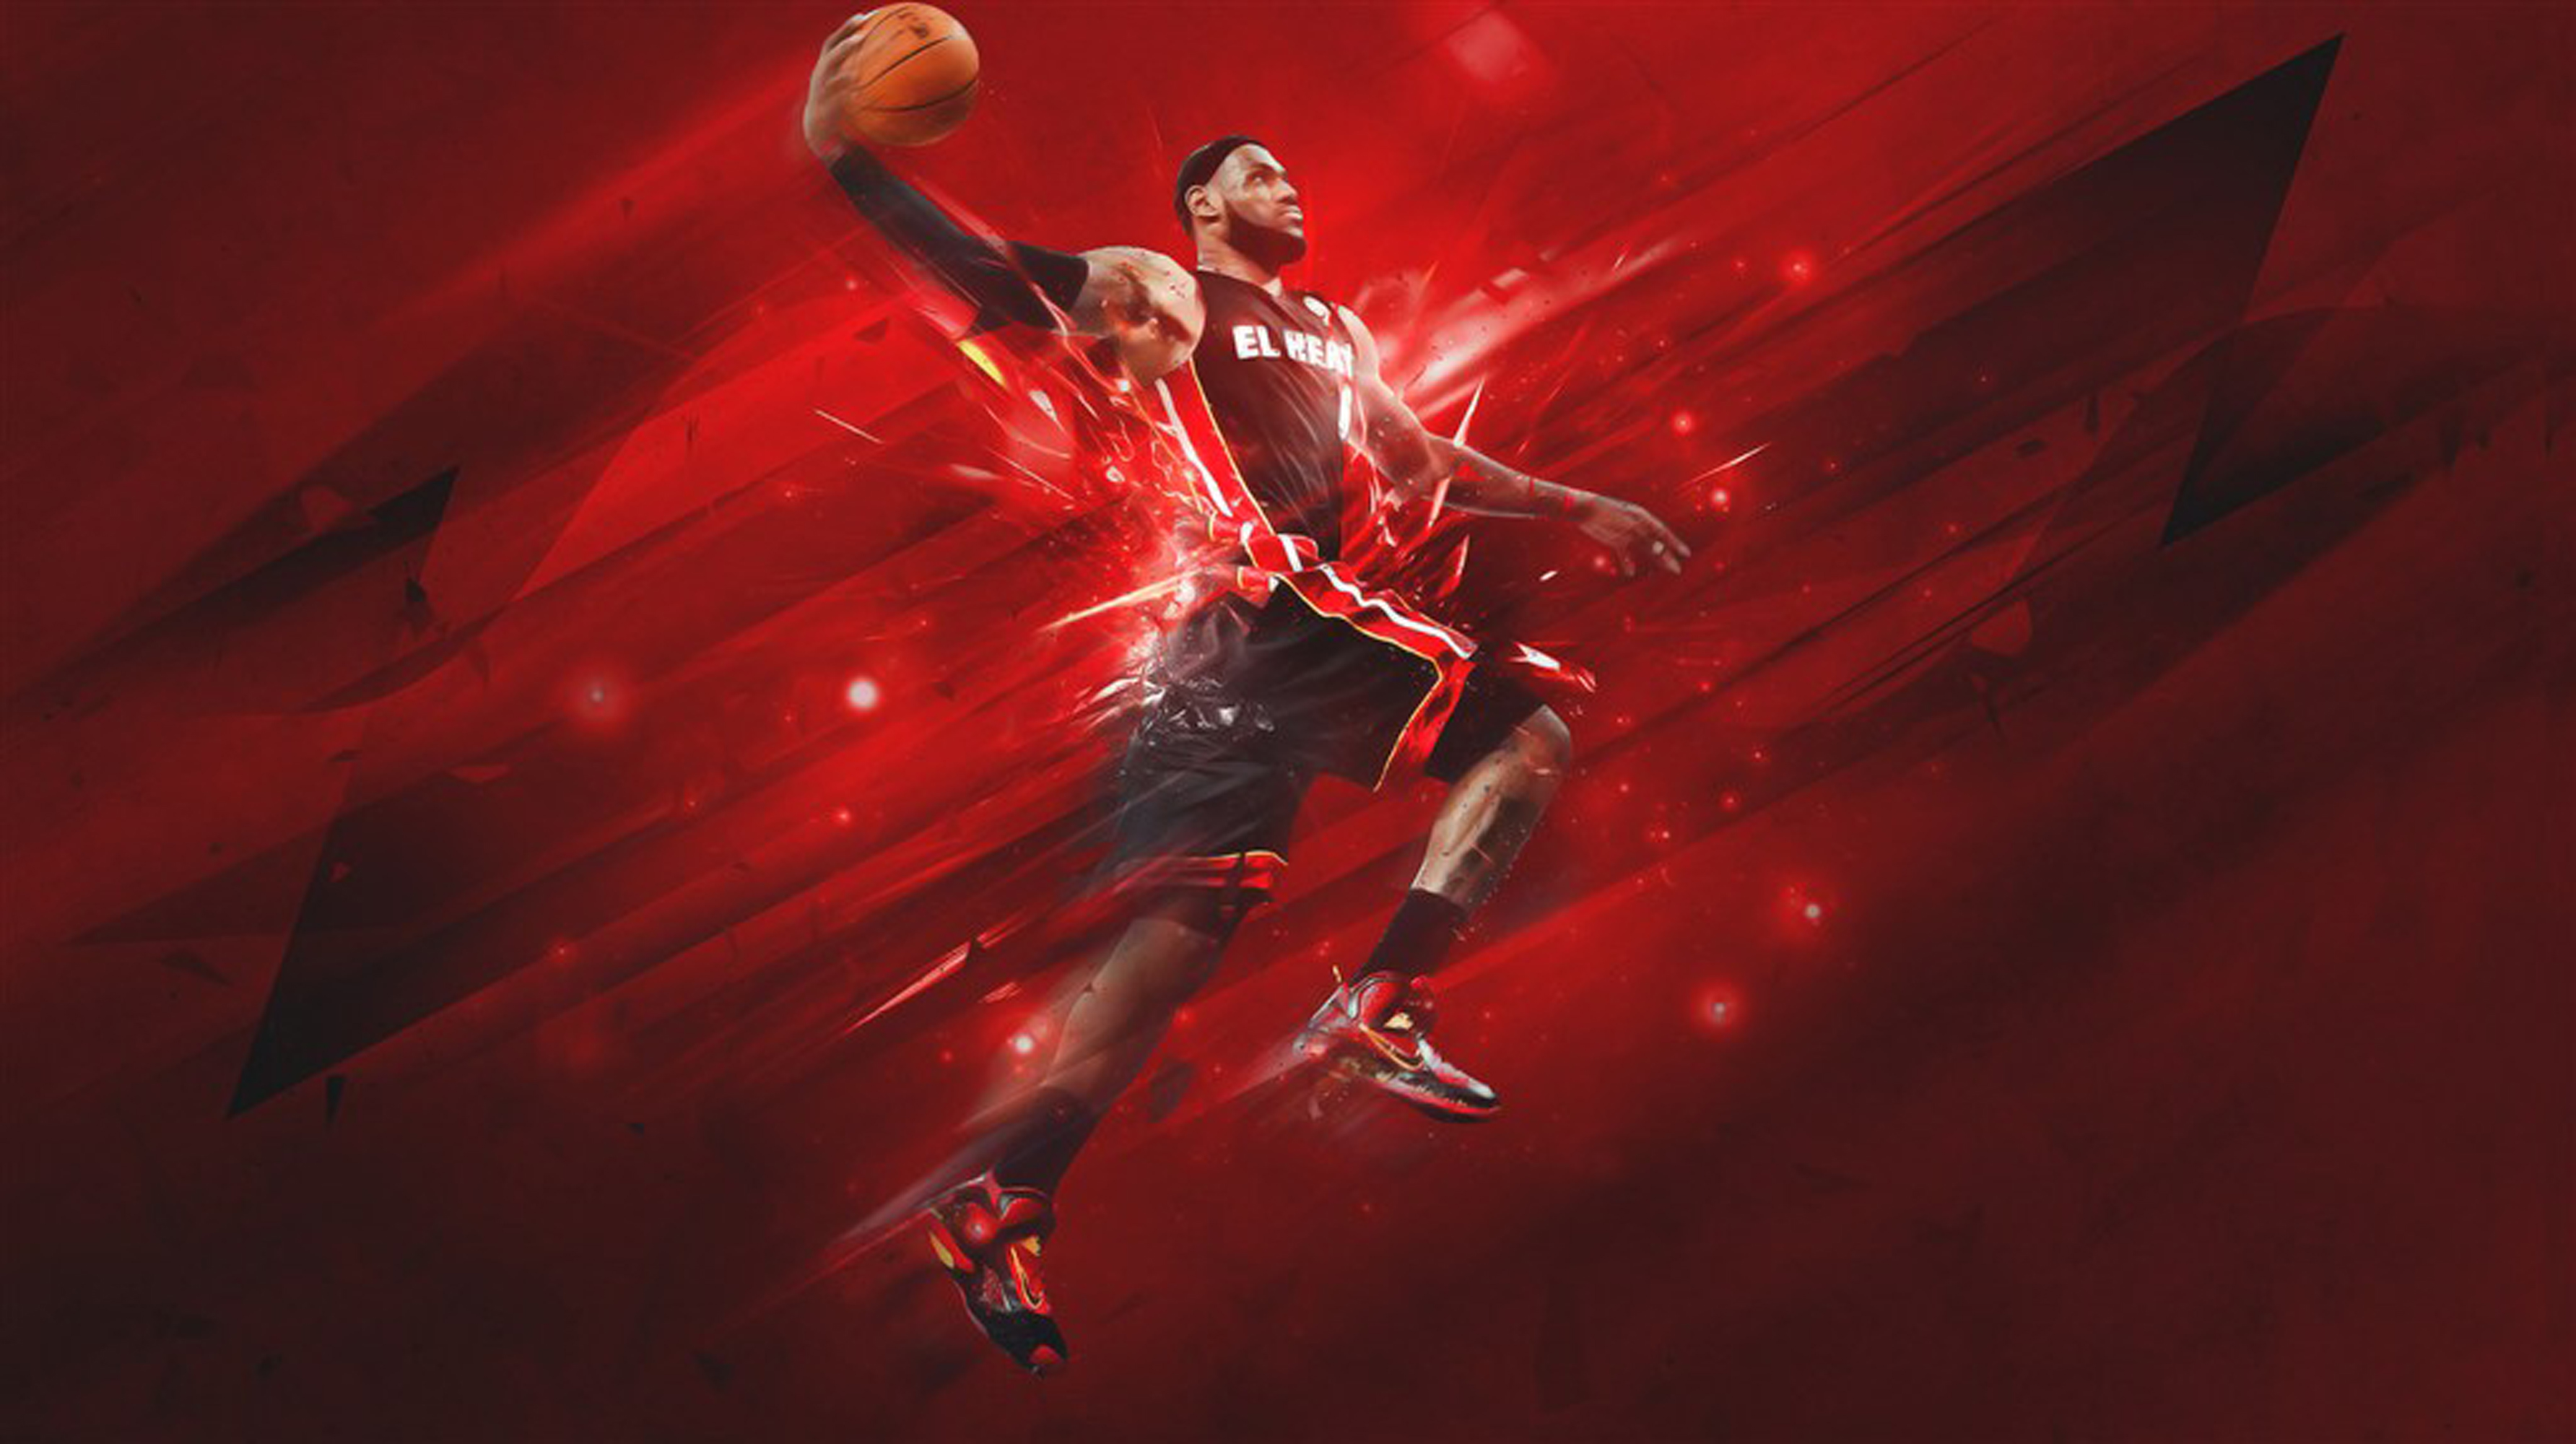 Basketball Star Lebron James Poster Background, Basketball ...